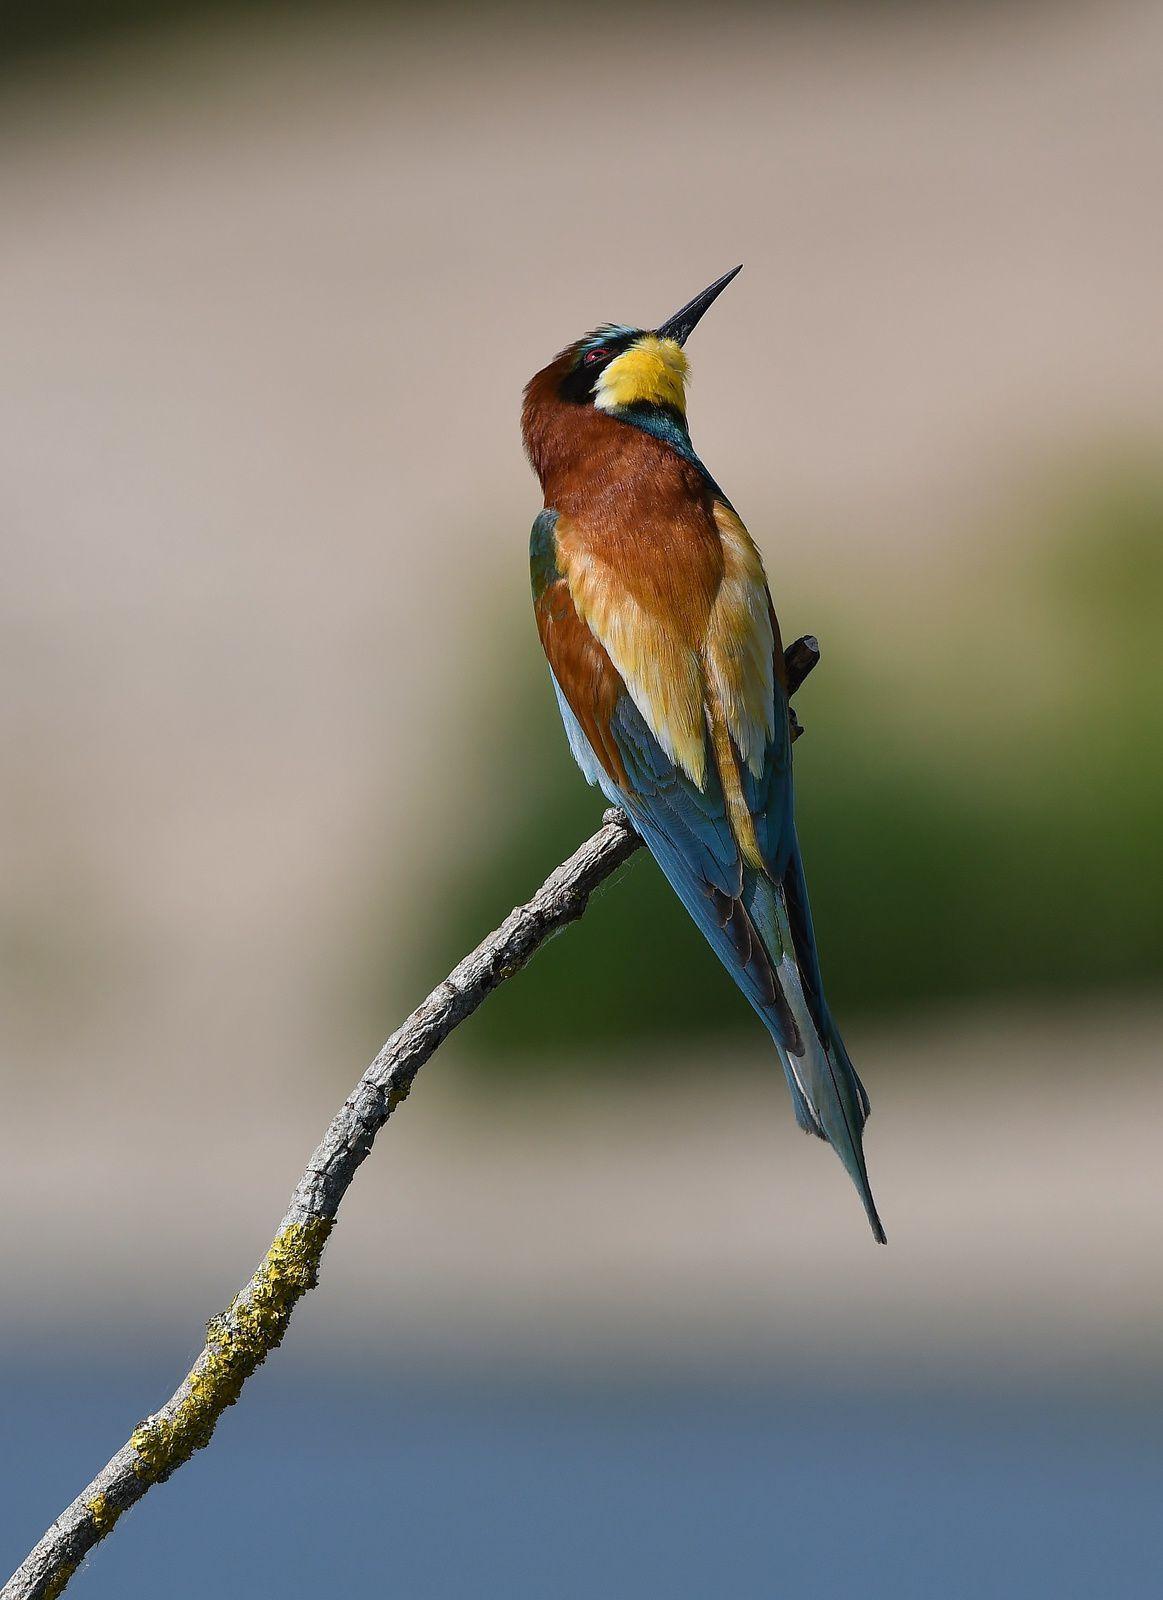 Guêpier d'Europe (Merops apiaster).